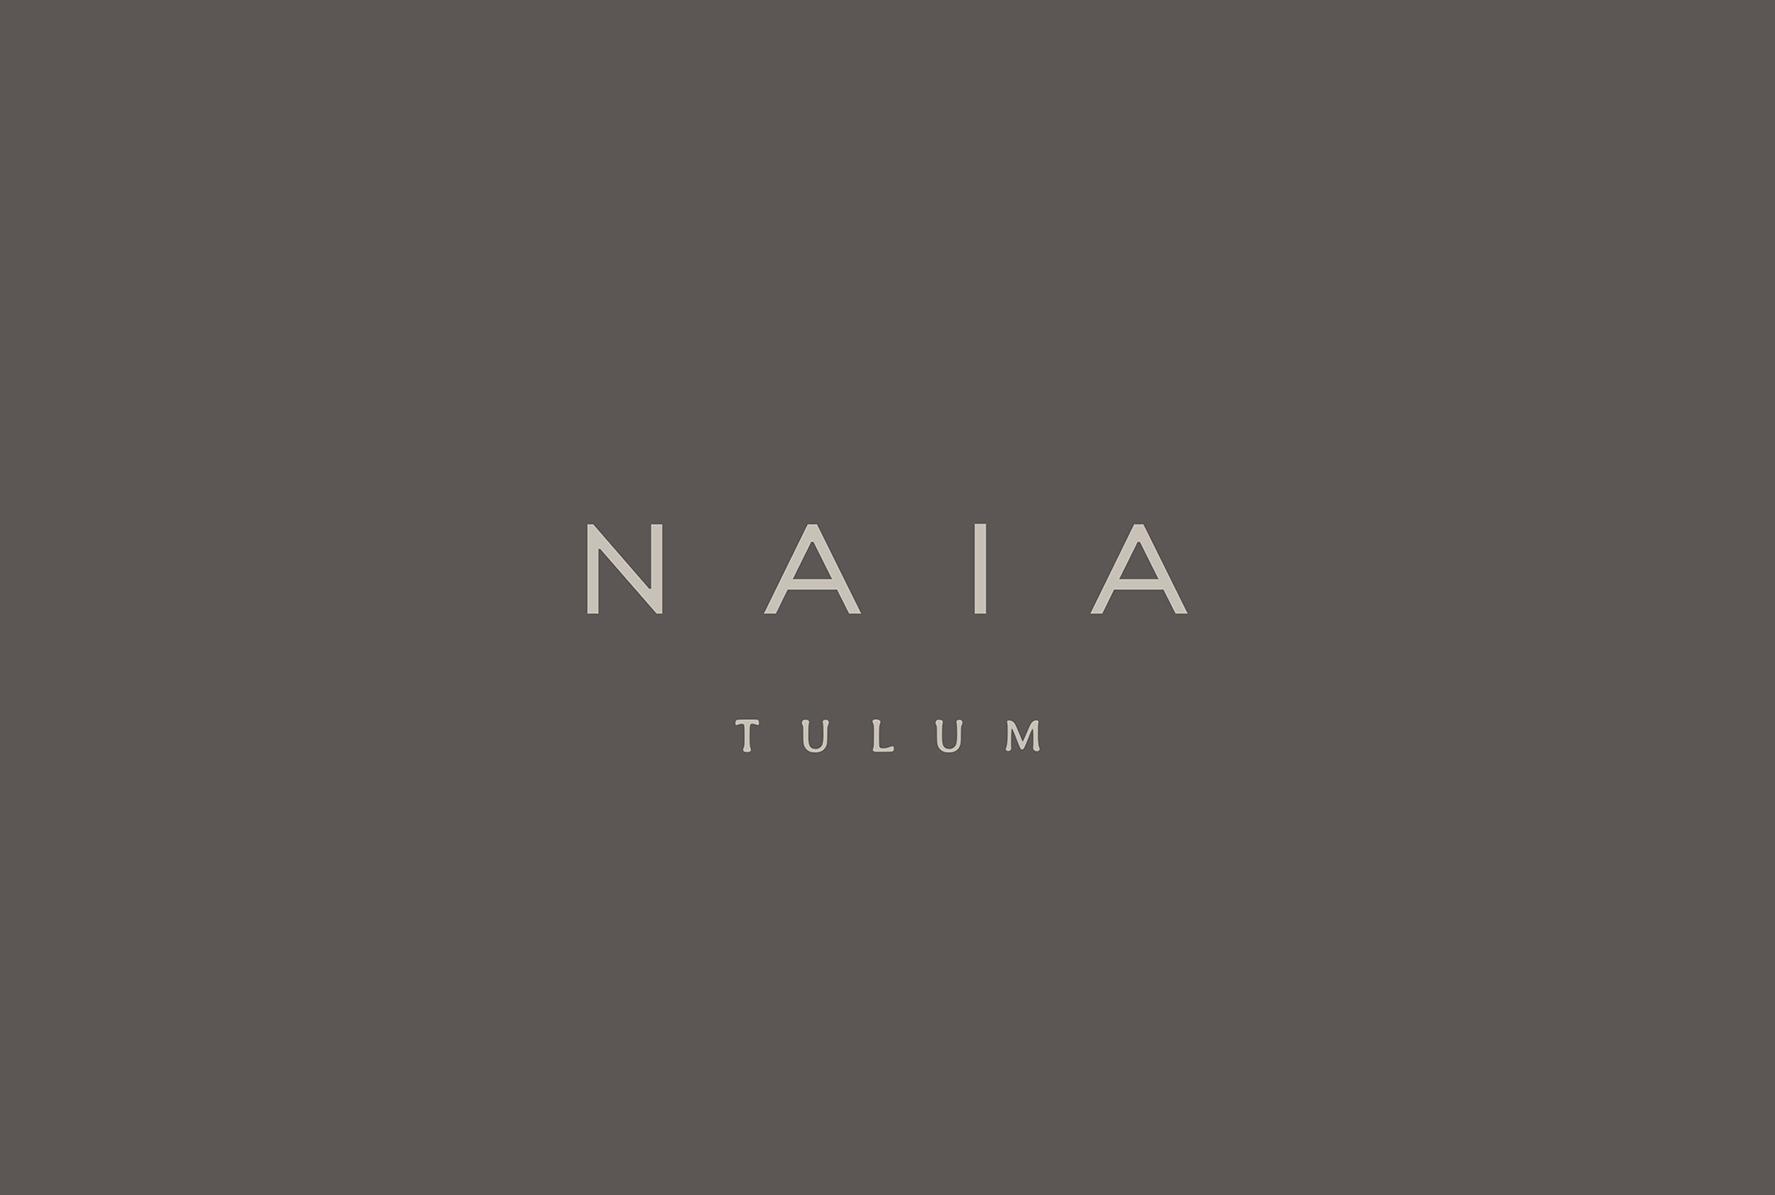 Naia一家精品店的品牌设计 欣赏-第2张